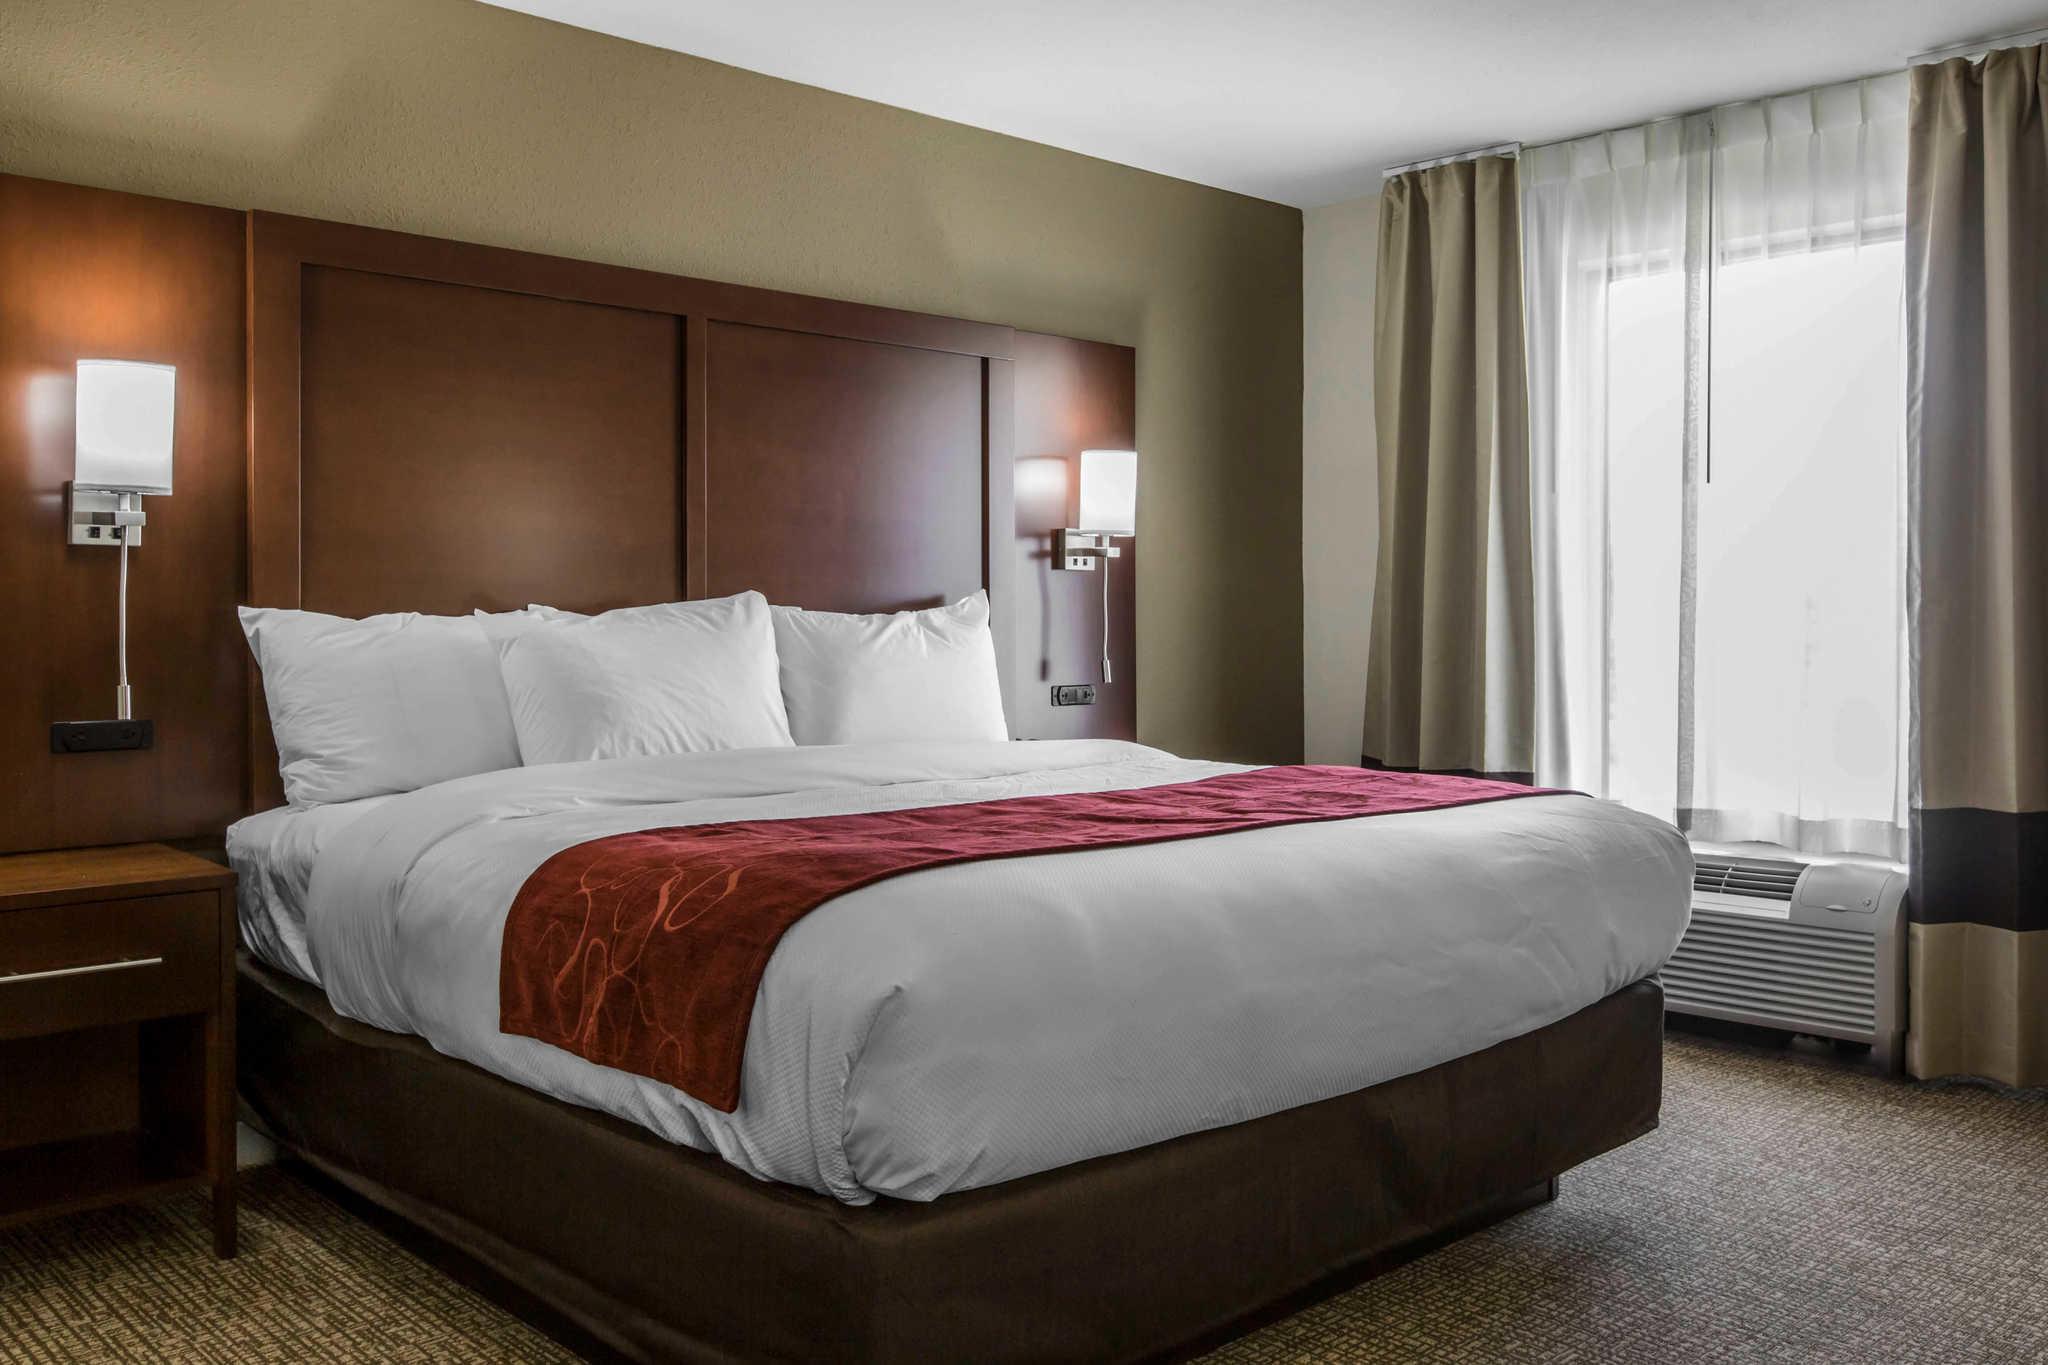 Comfort Inn & Suites West image 24